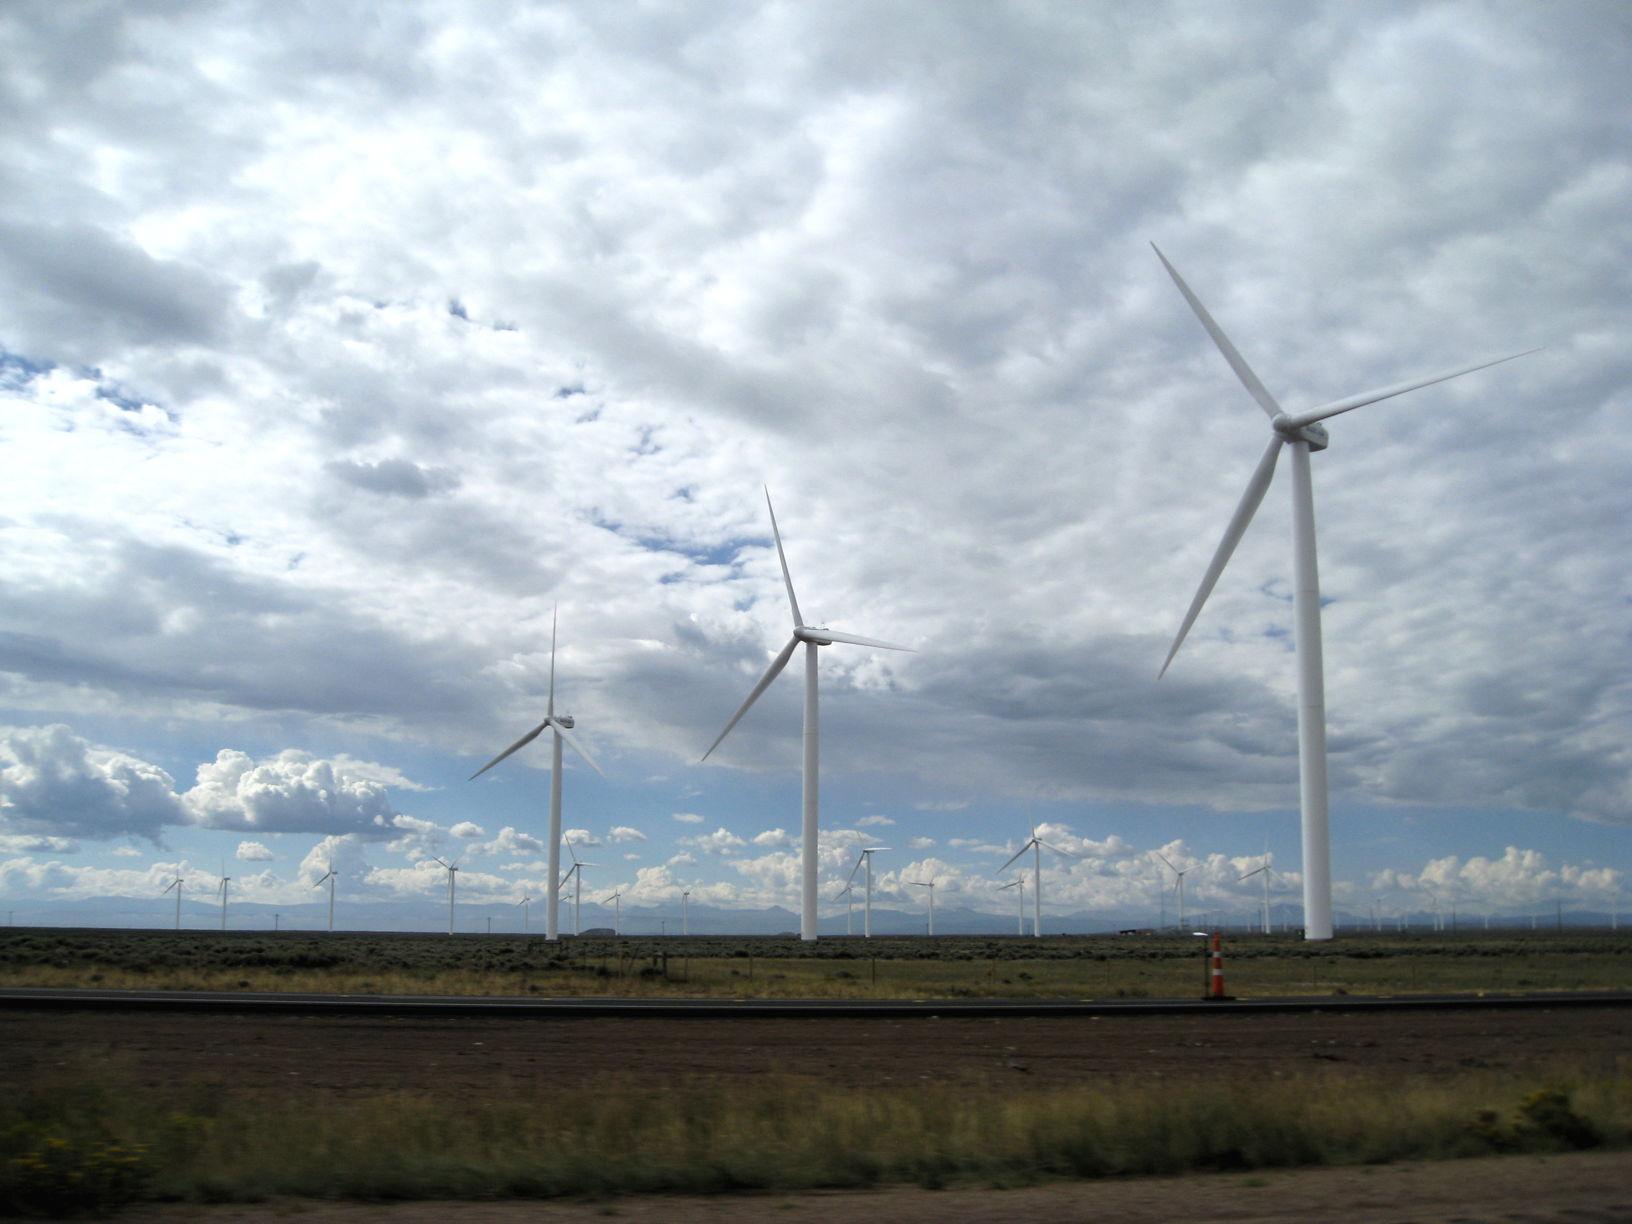 wpid-WindfarminNebraska-2014-08-23-18-15.jpg